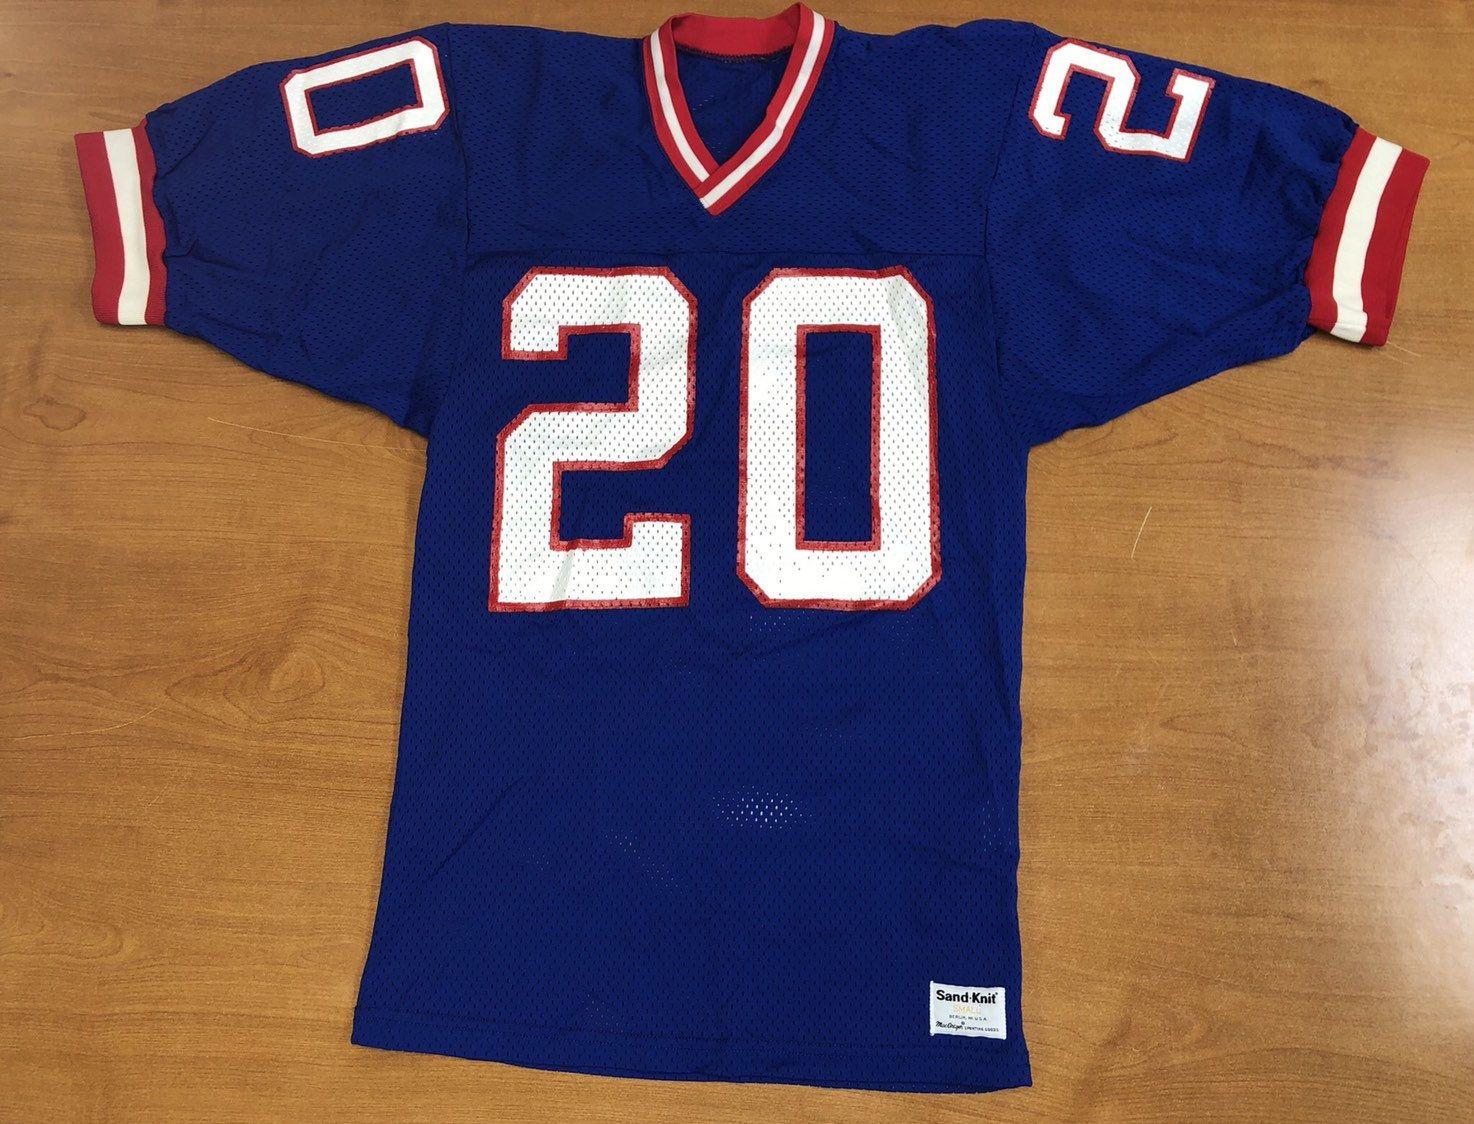 Vintage 1987 Jim Morris New York Giants Sand Knit Jersey Super Etsy In 2020 New York Giants Jersey New York Giants Vintage New York